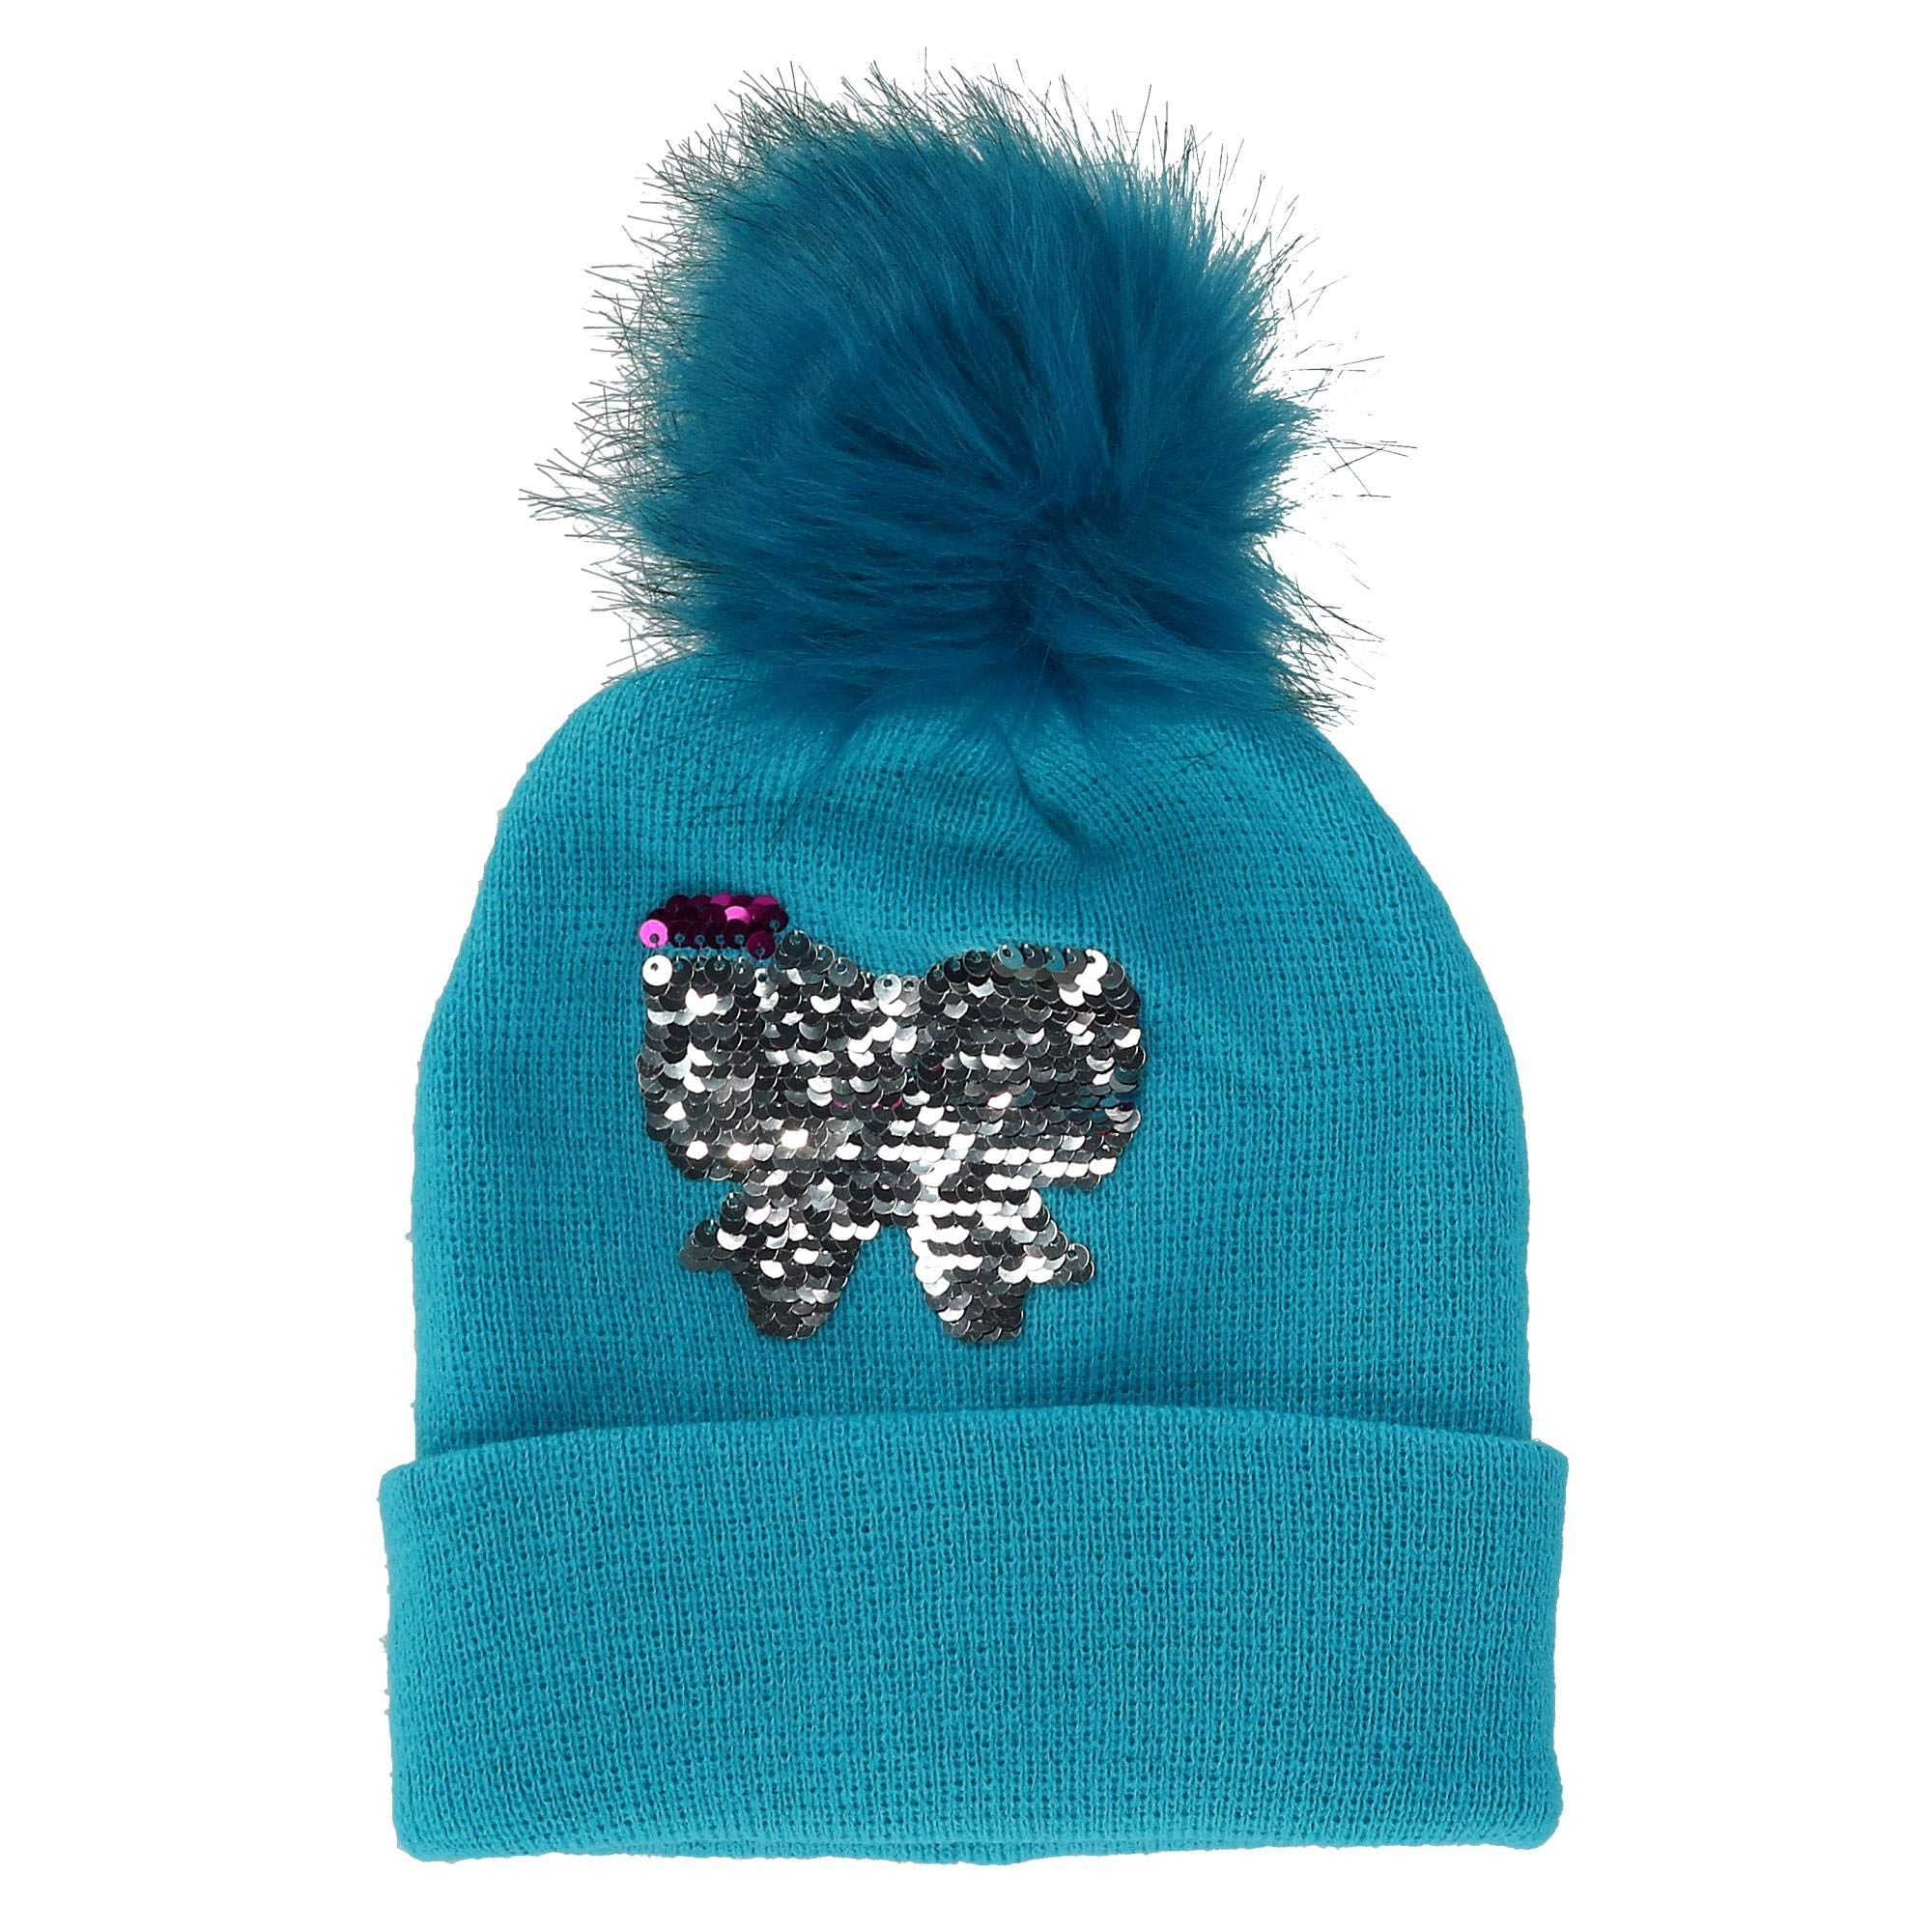 Alexa Rose Girls' Sequins Cuff Beanie Hat with Pom, Blue